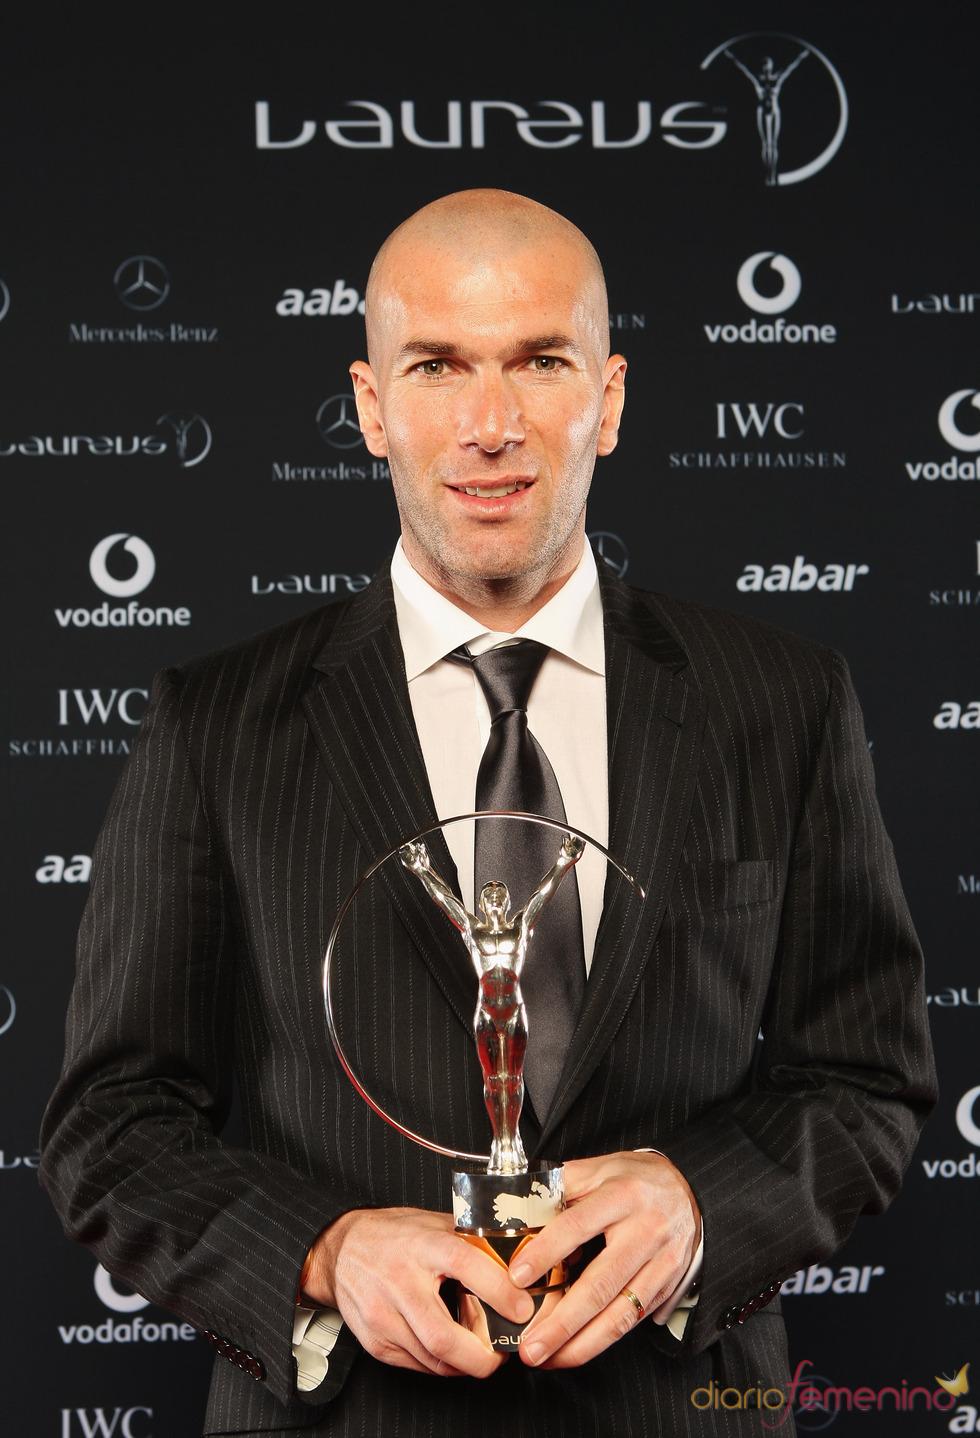 Zinedine Zidane con el Premio Laureus 2011